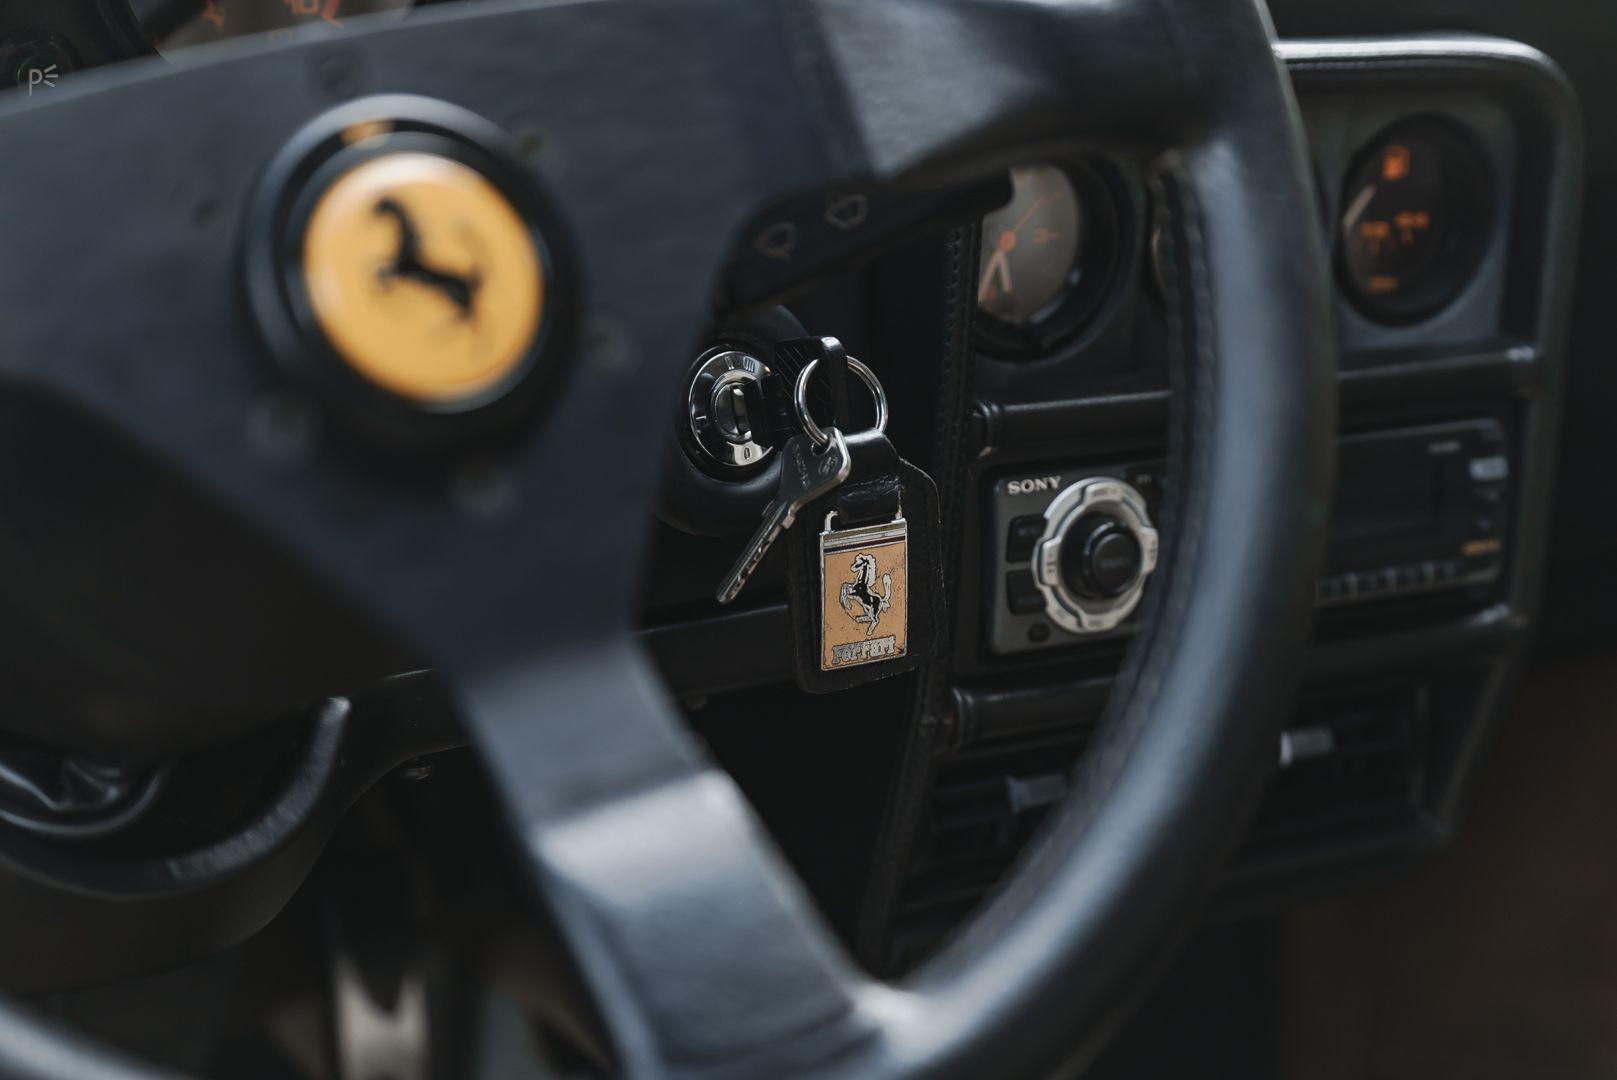 1988 FERRARI 208 GTS TURBO INTERCOOLER 75411